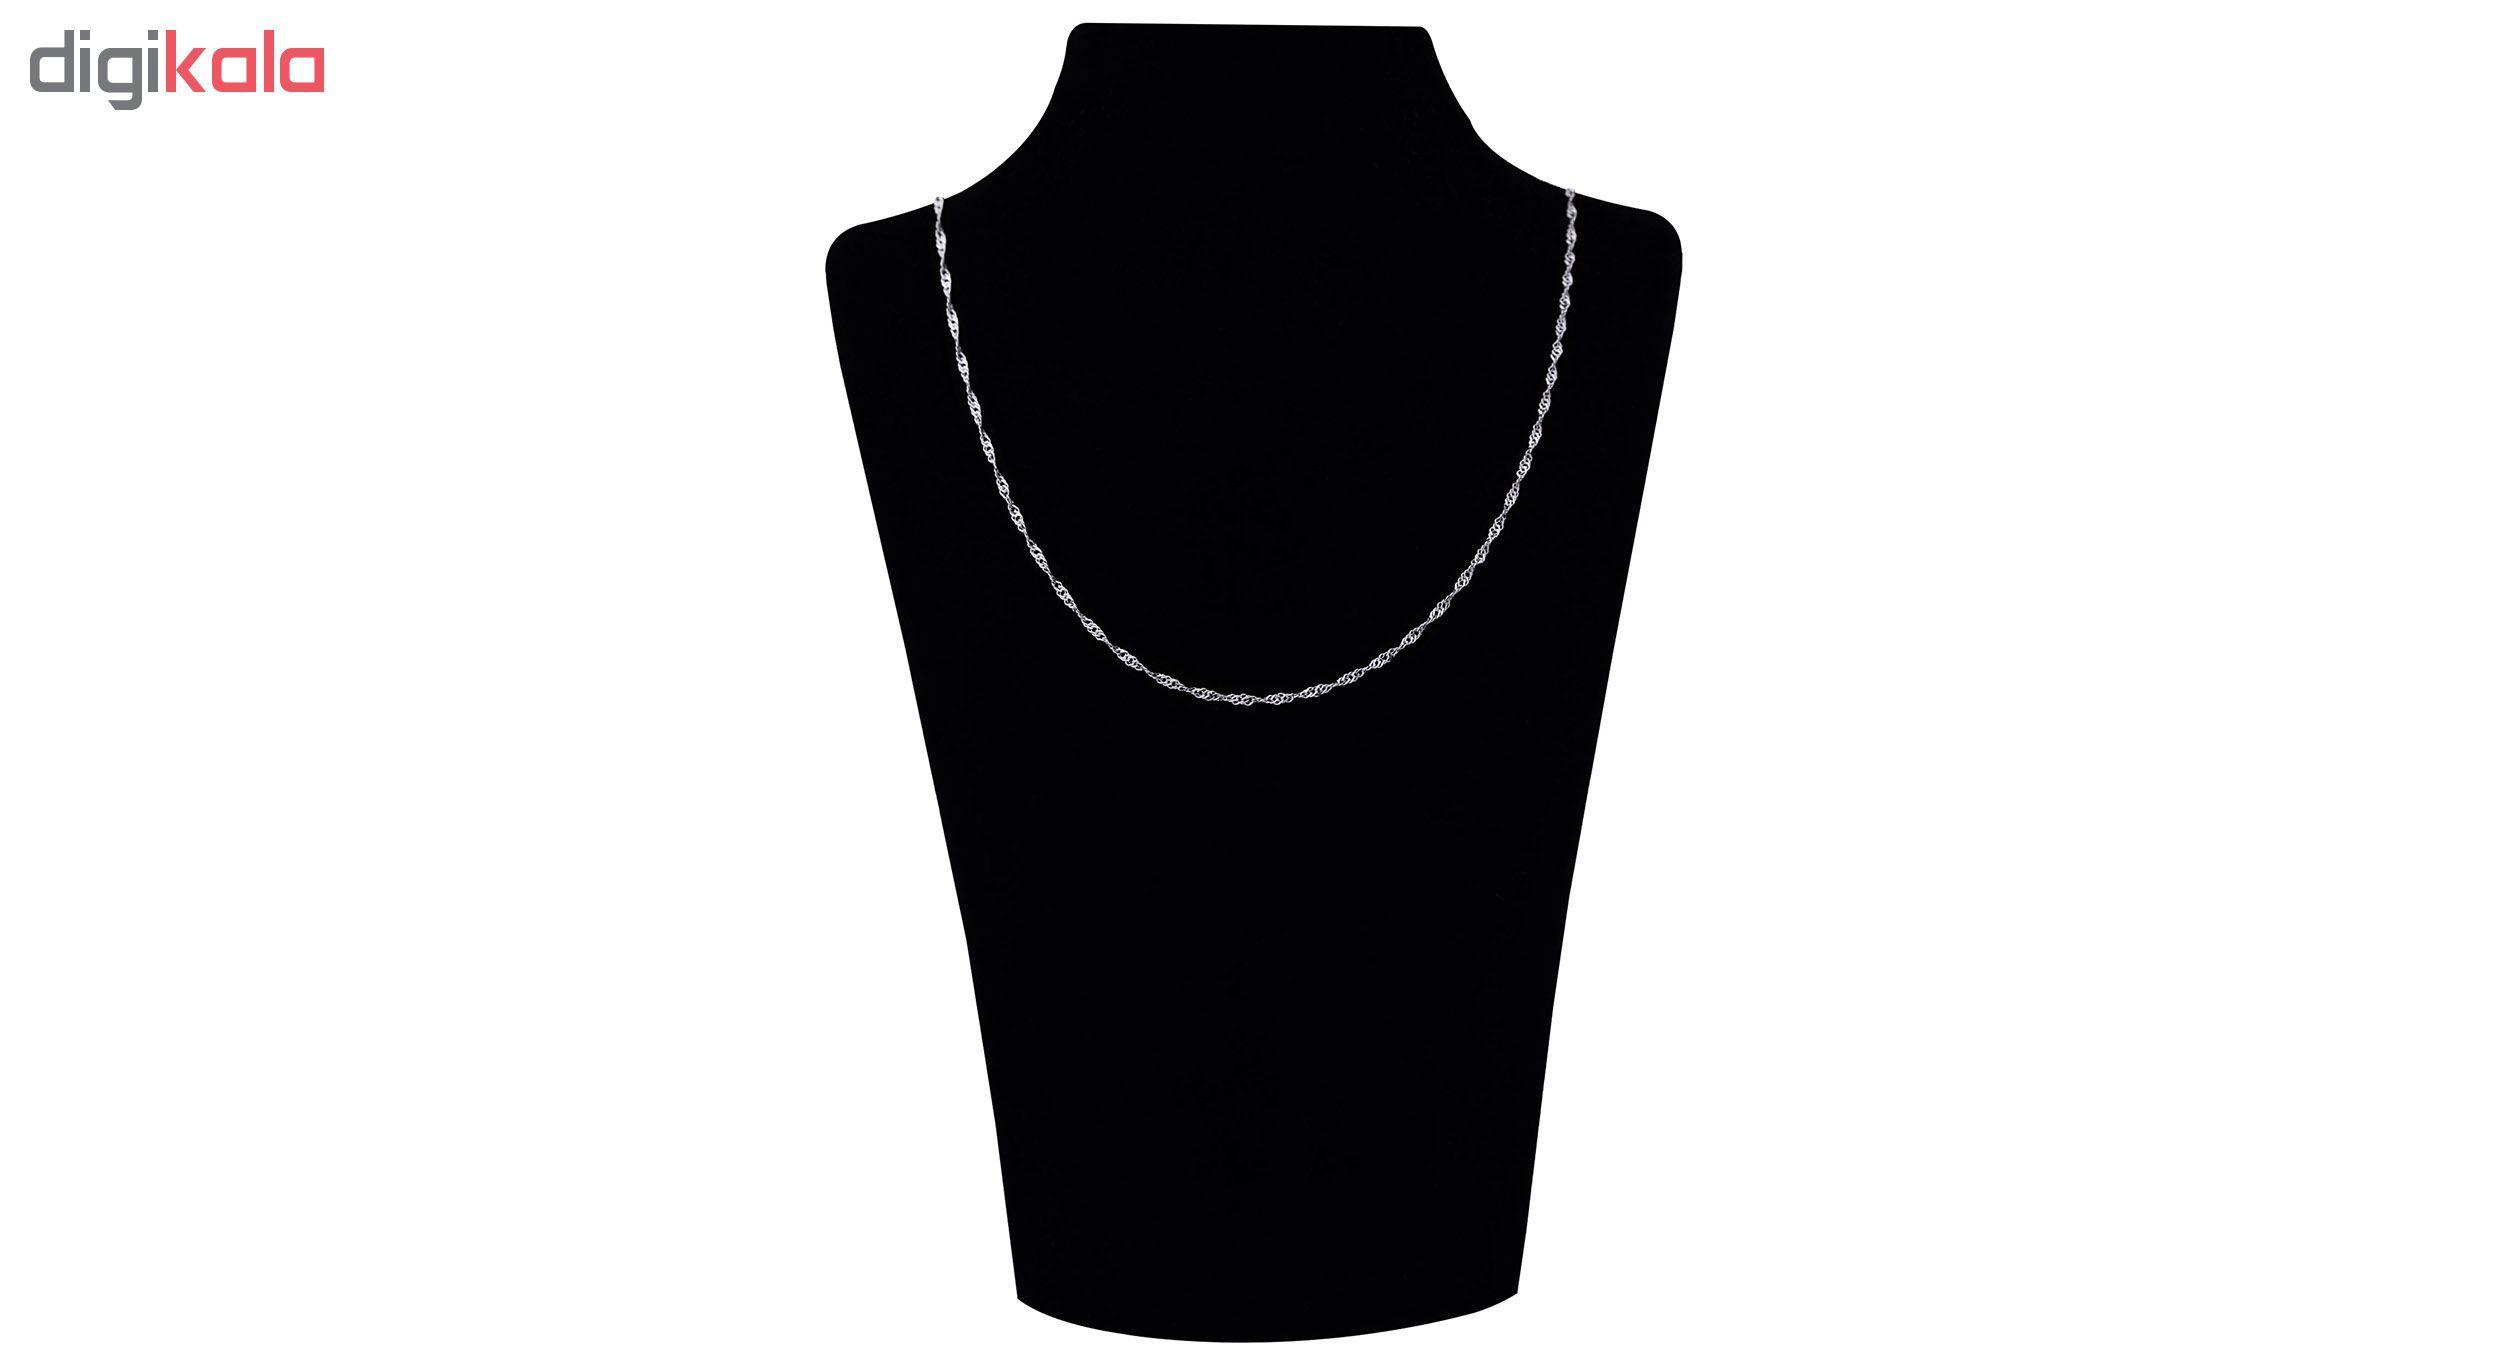 زنجیر نقره زنانه آرگو کد B-40